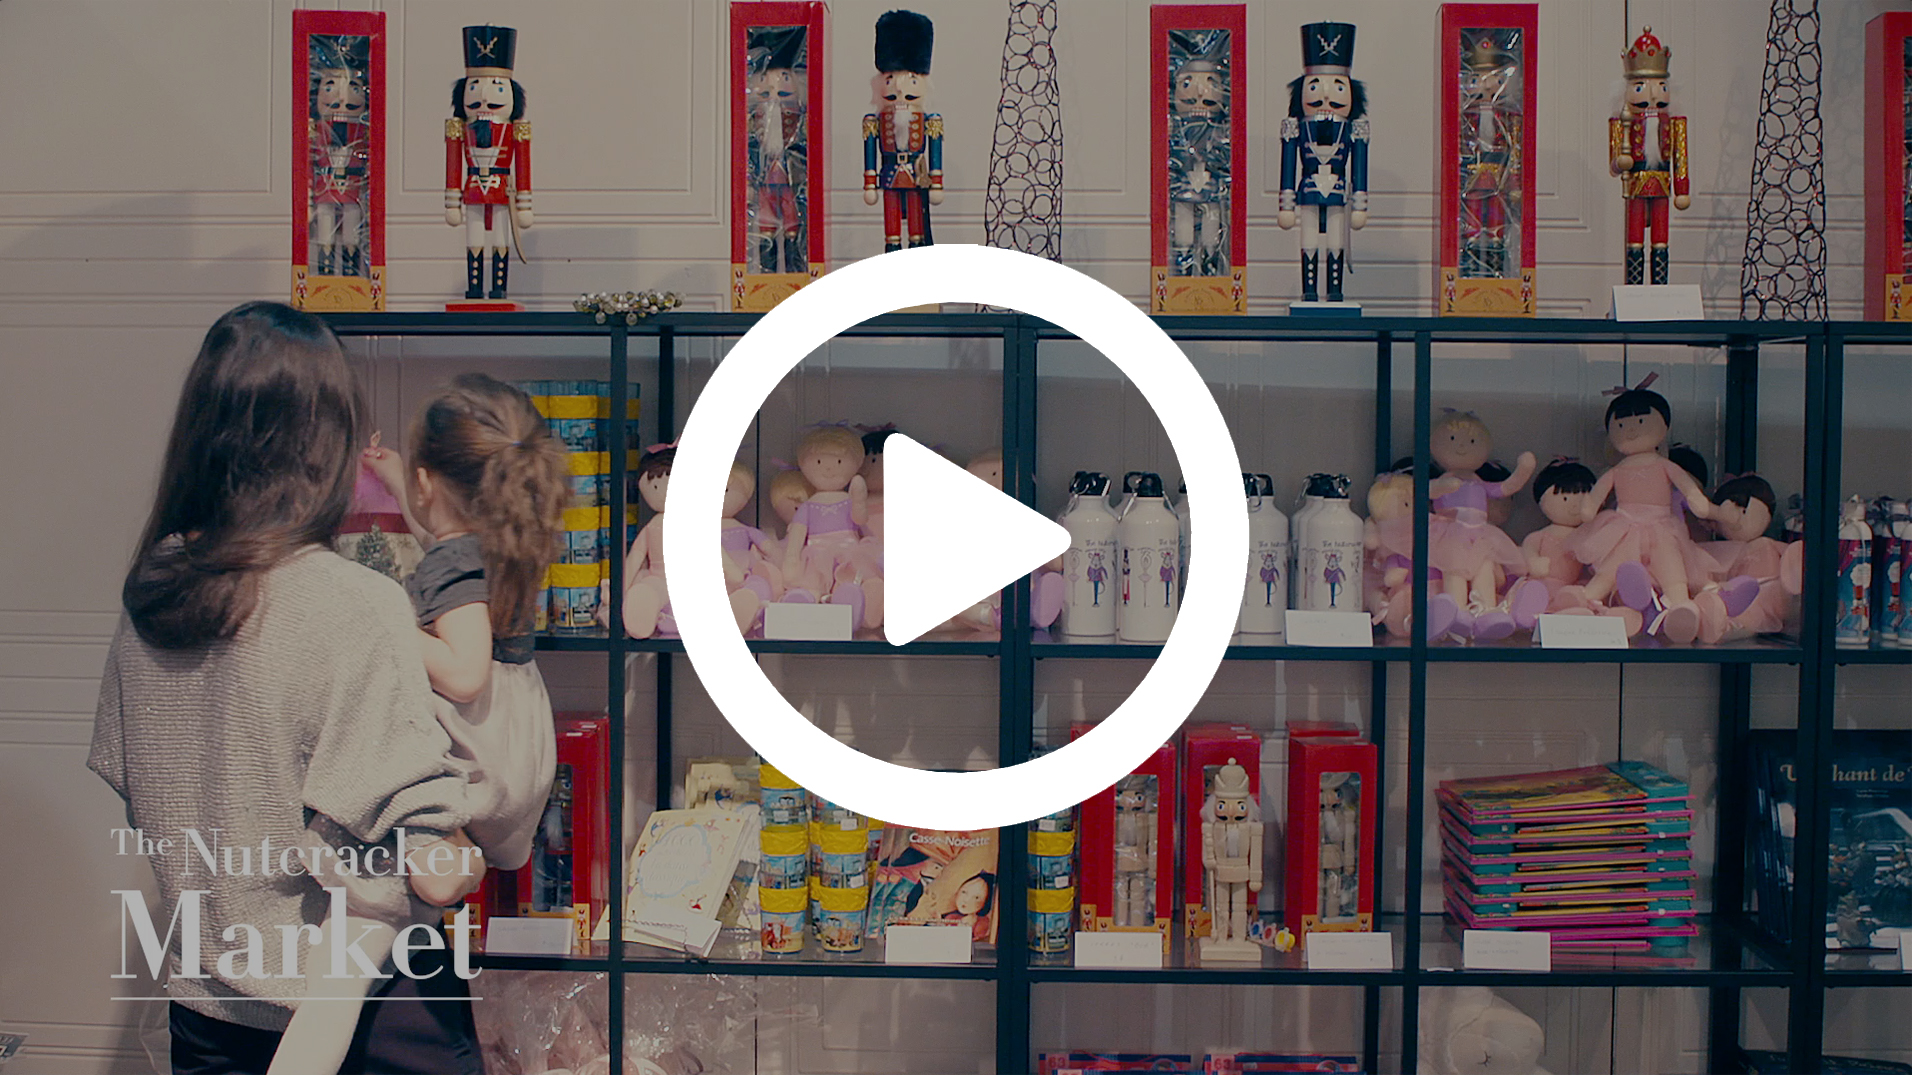 TV ad for The Nutcracker Market